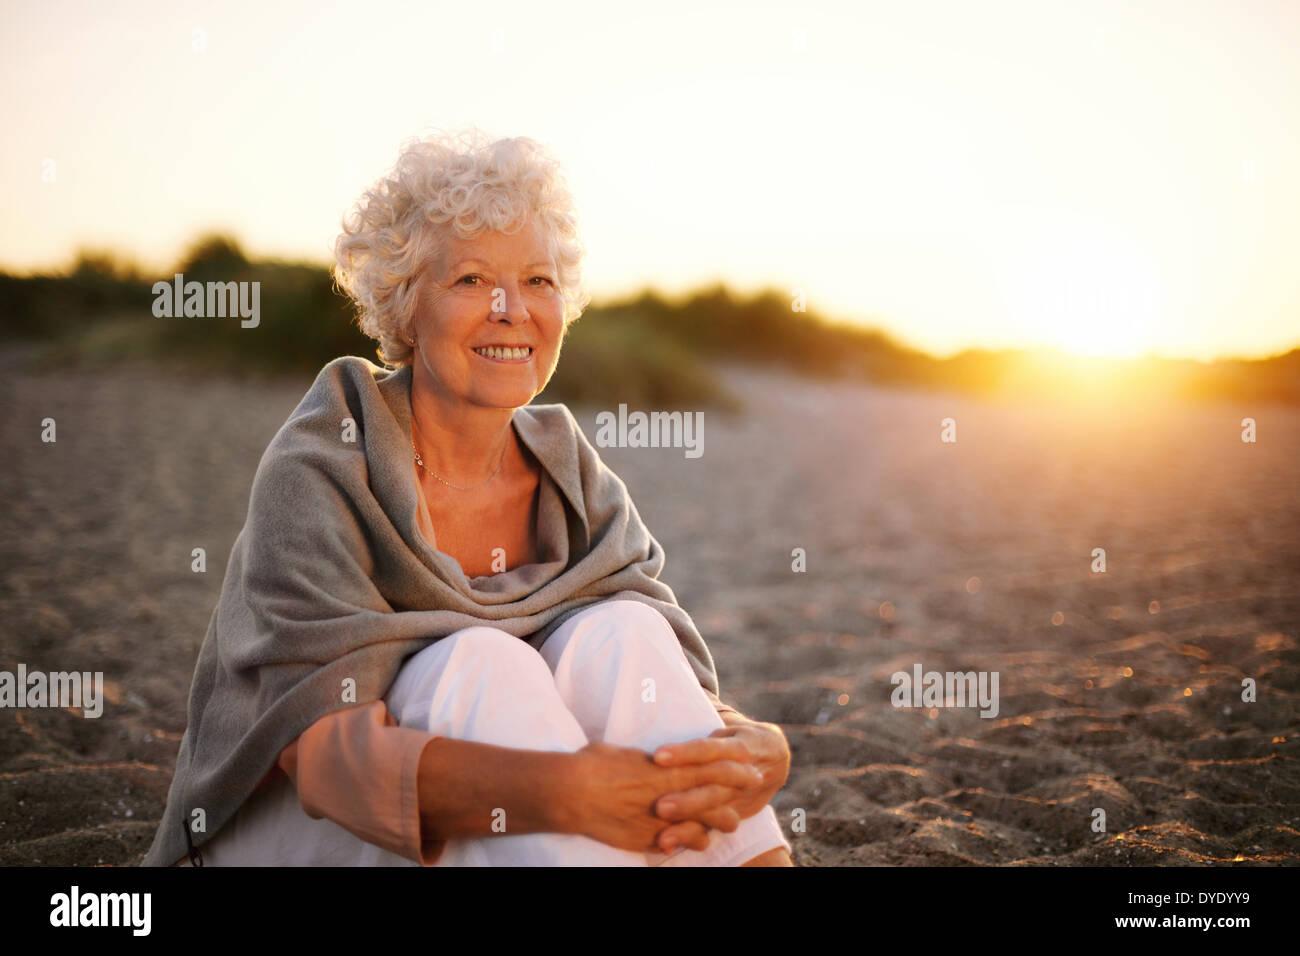 Portrait of smiling vieille femme assis sur la plage. Young Woman relaxing outdoors Photo Stock